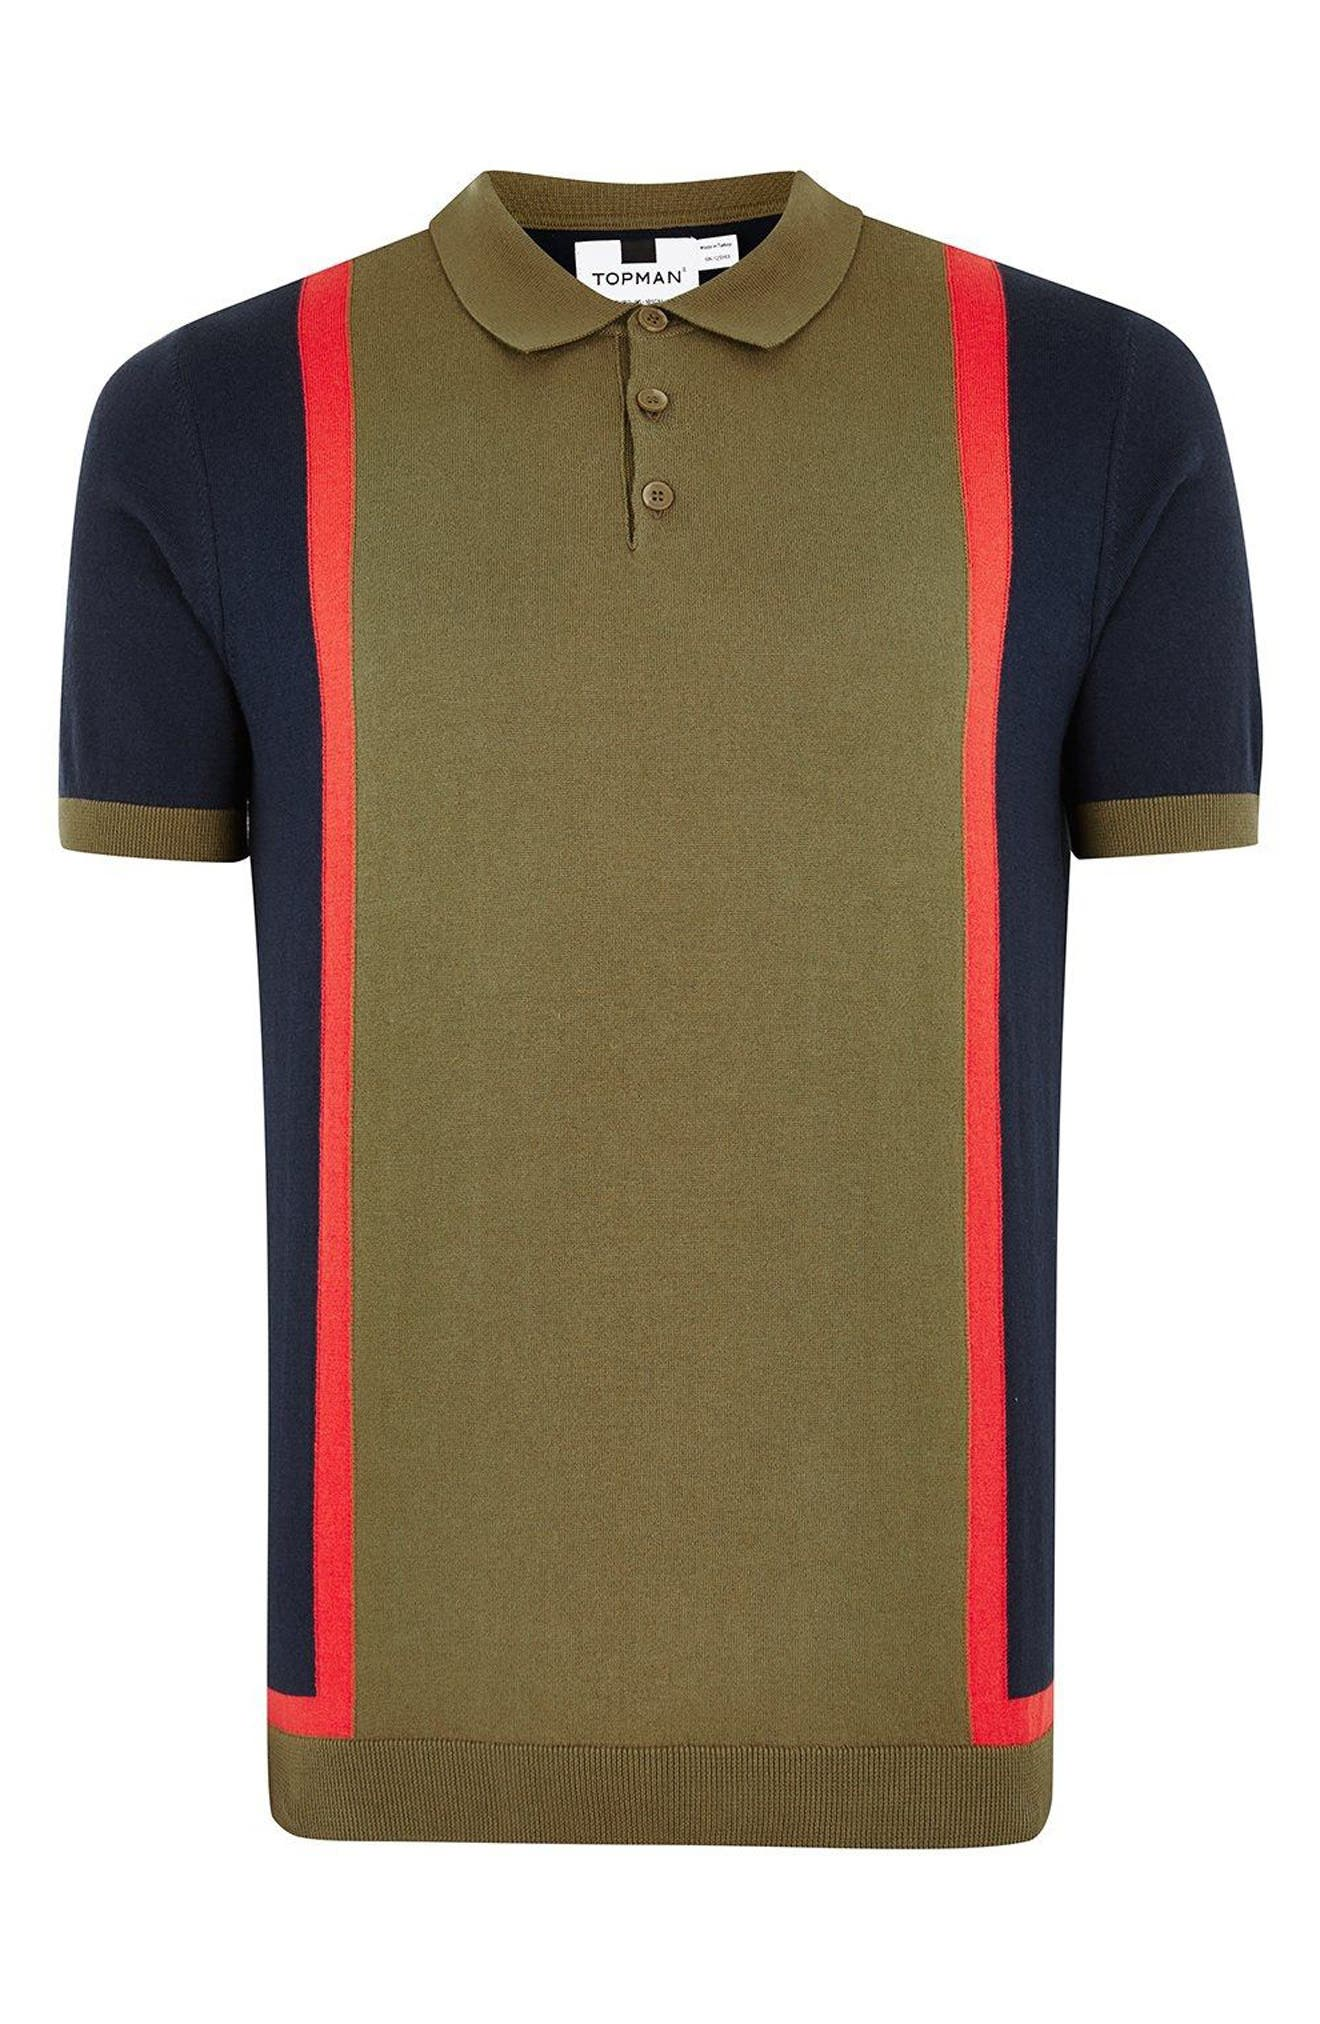 TOPMAN,                             Colorblock Classic Fit Polo,                             Alternate thumbnail 4, color,                             300